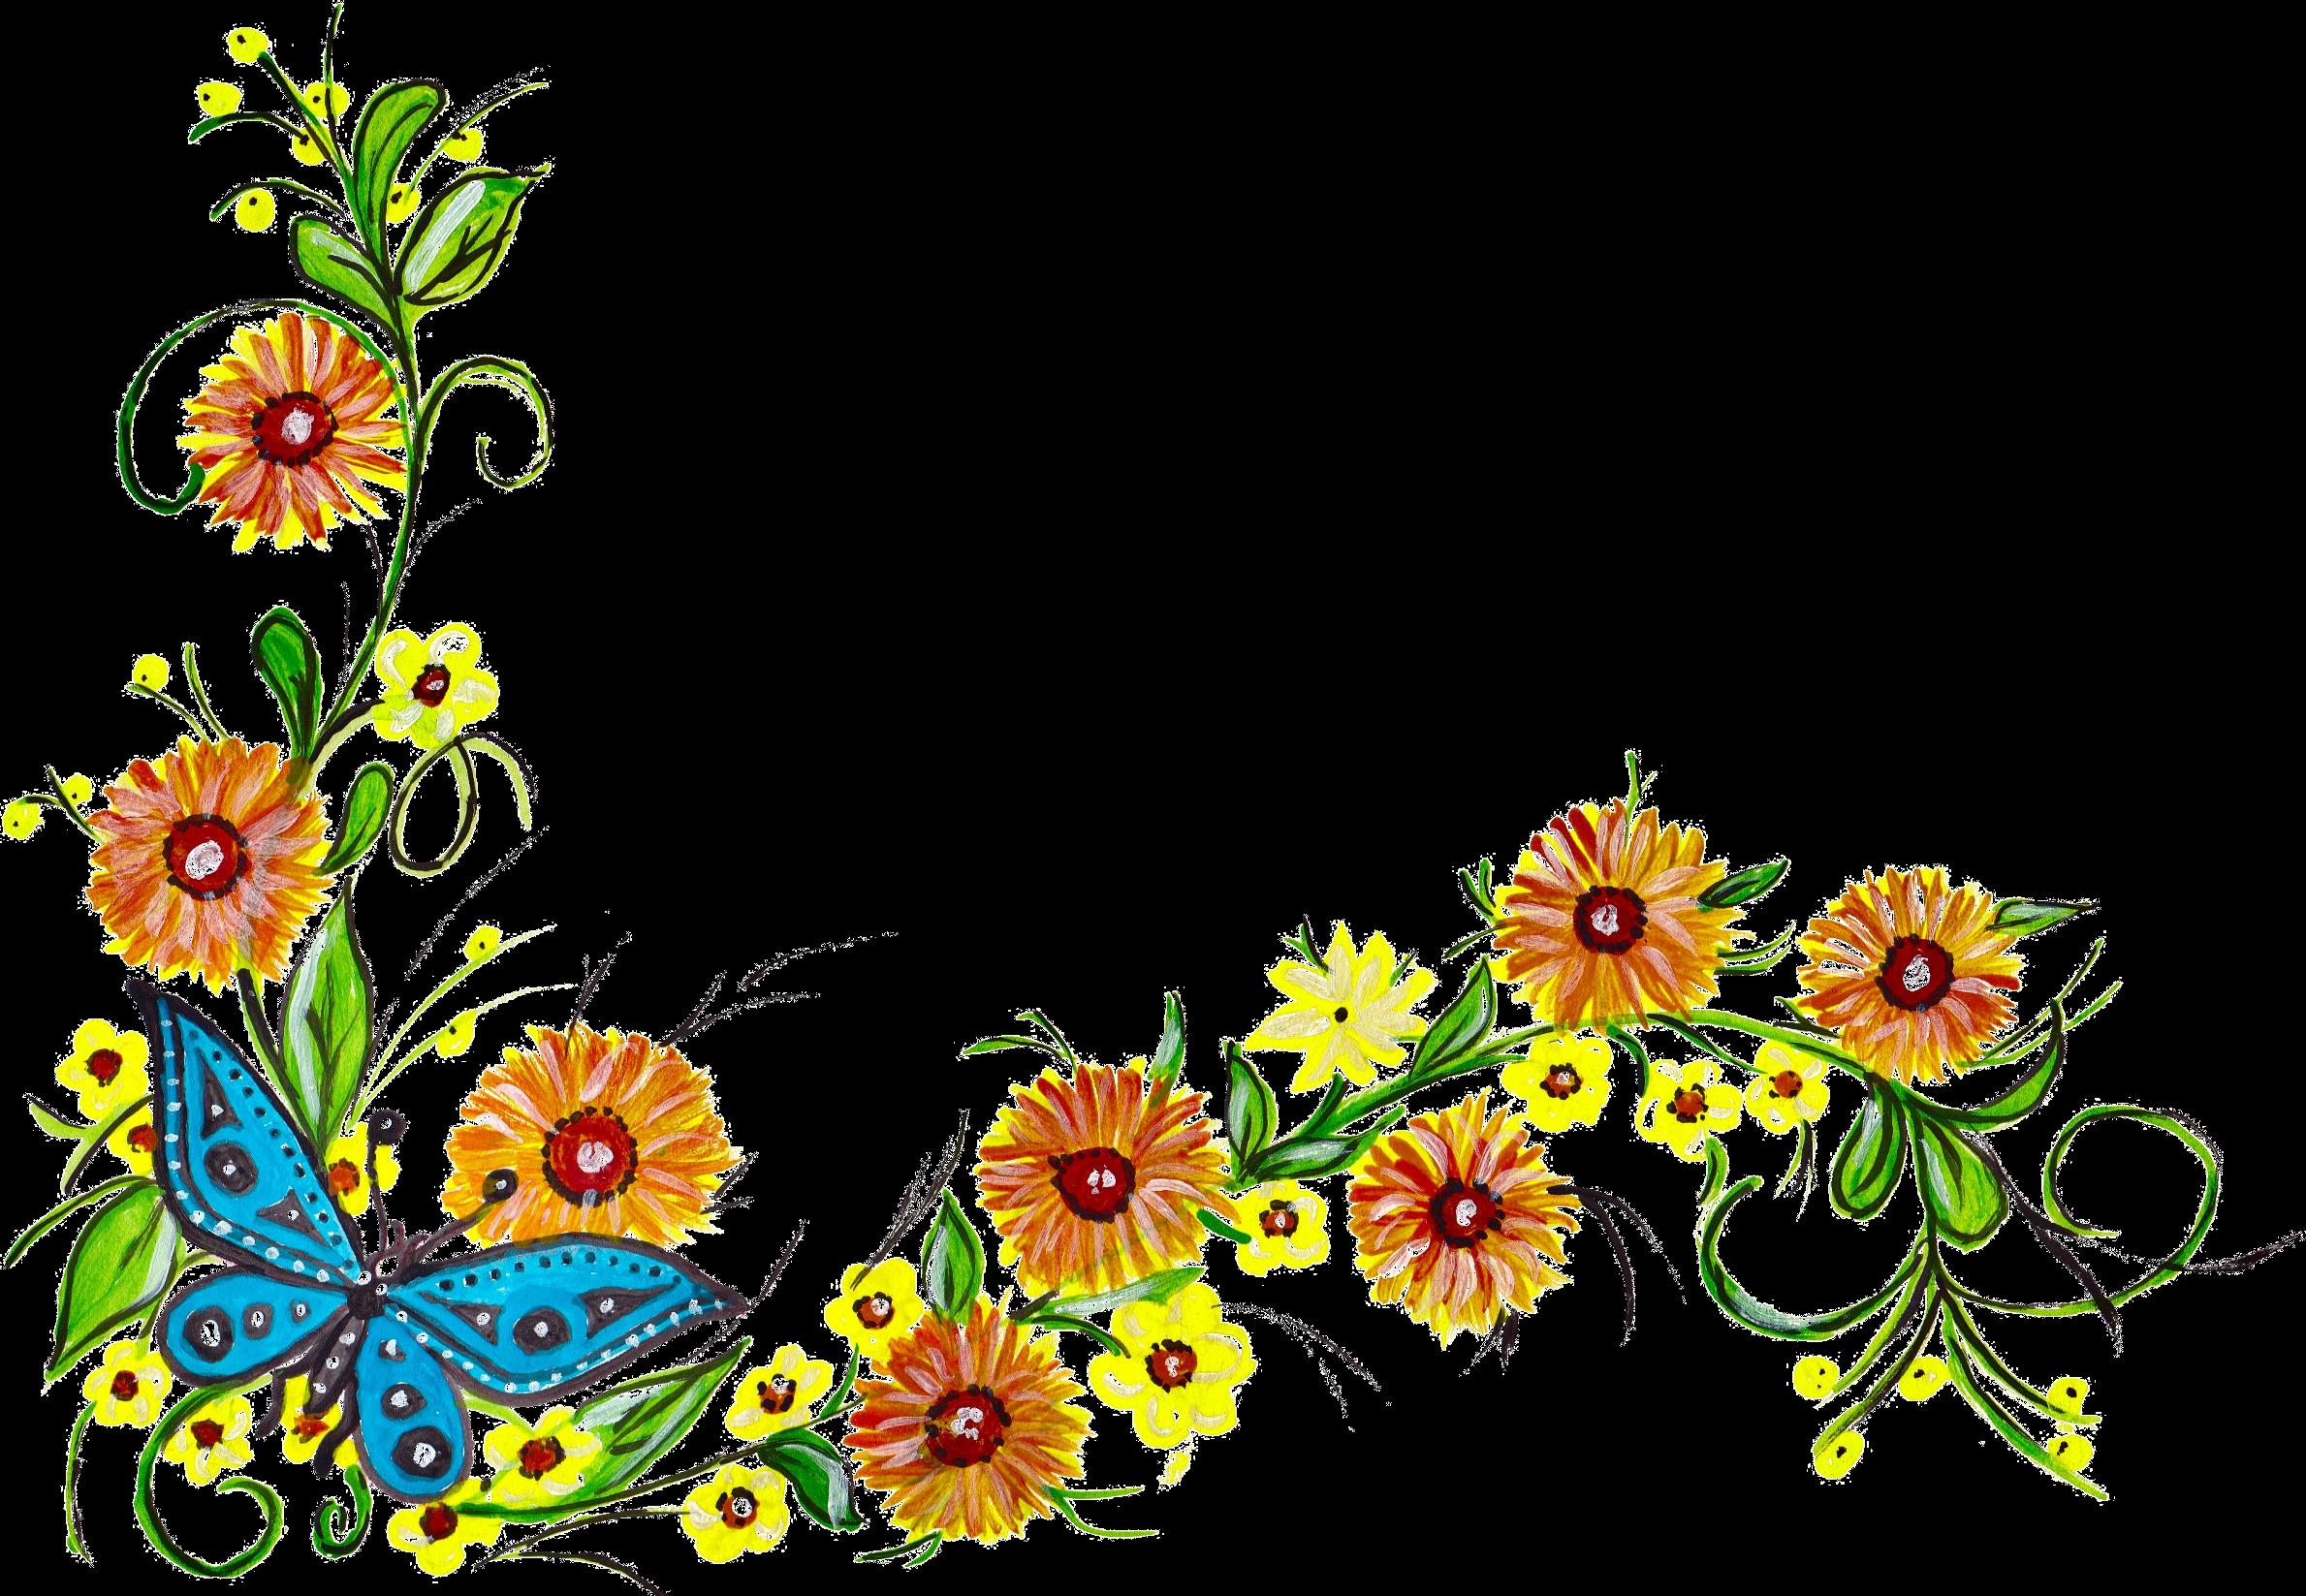 5 Flower Butterfly Corner (PNG Transparent) | OnlyGFX.com